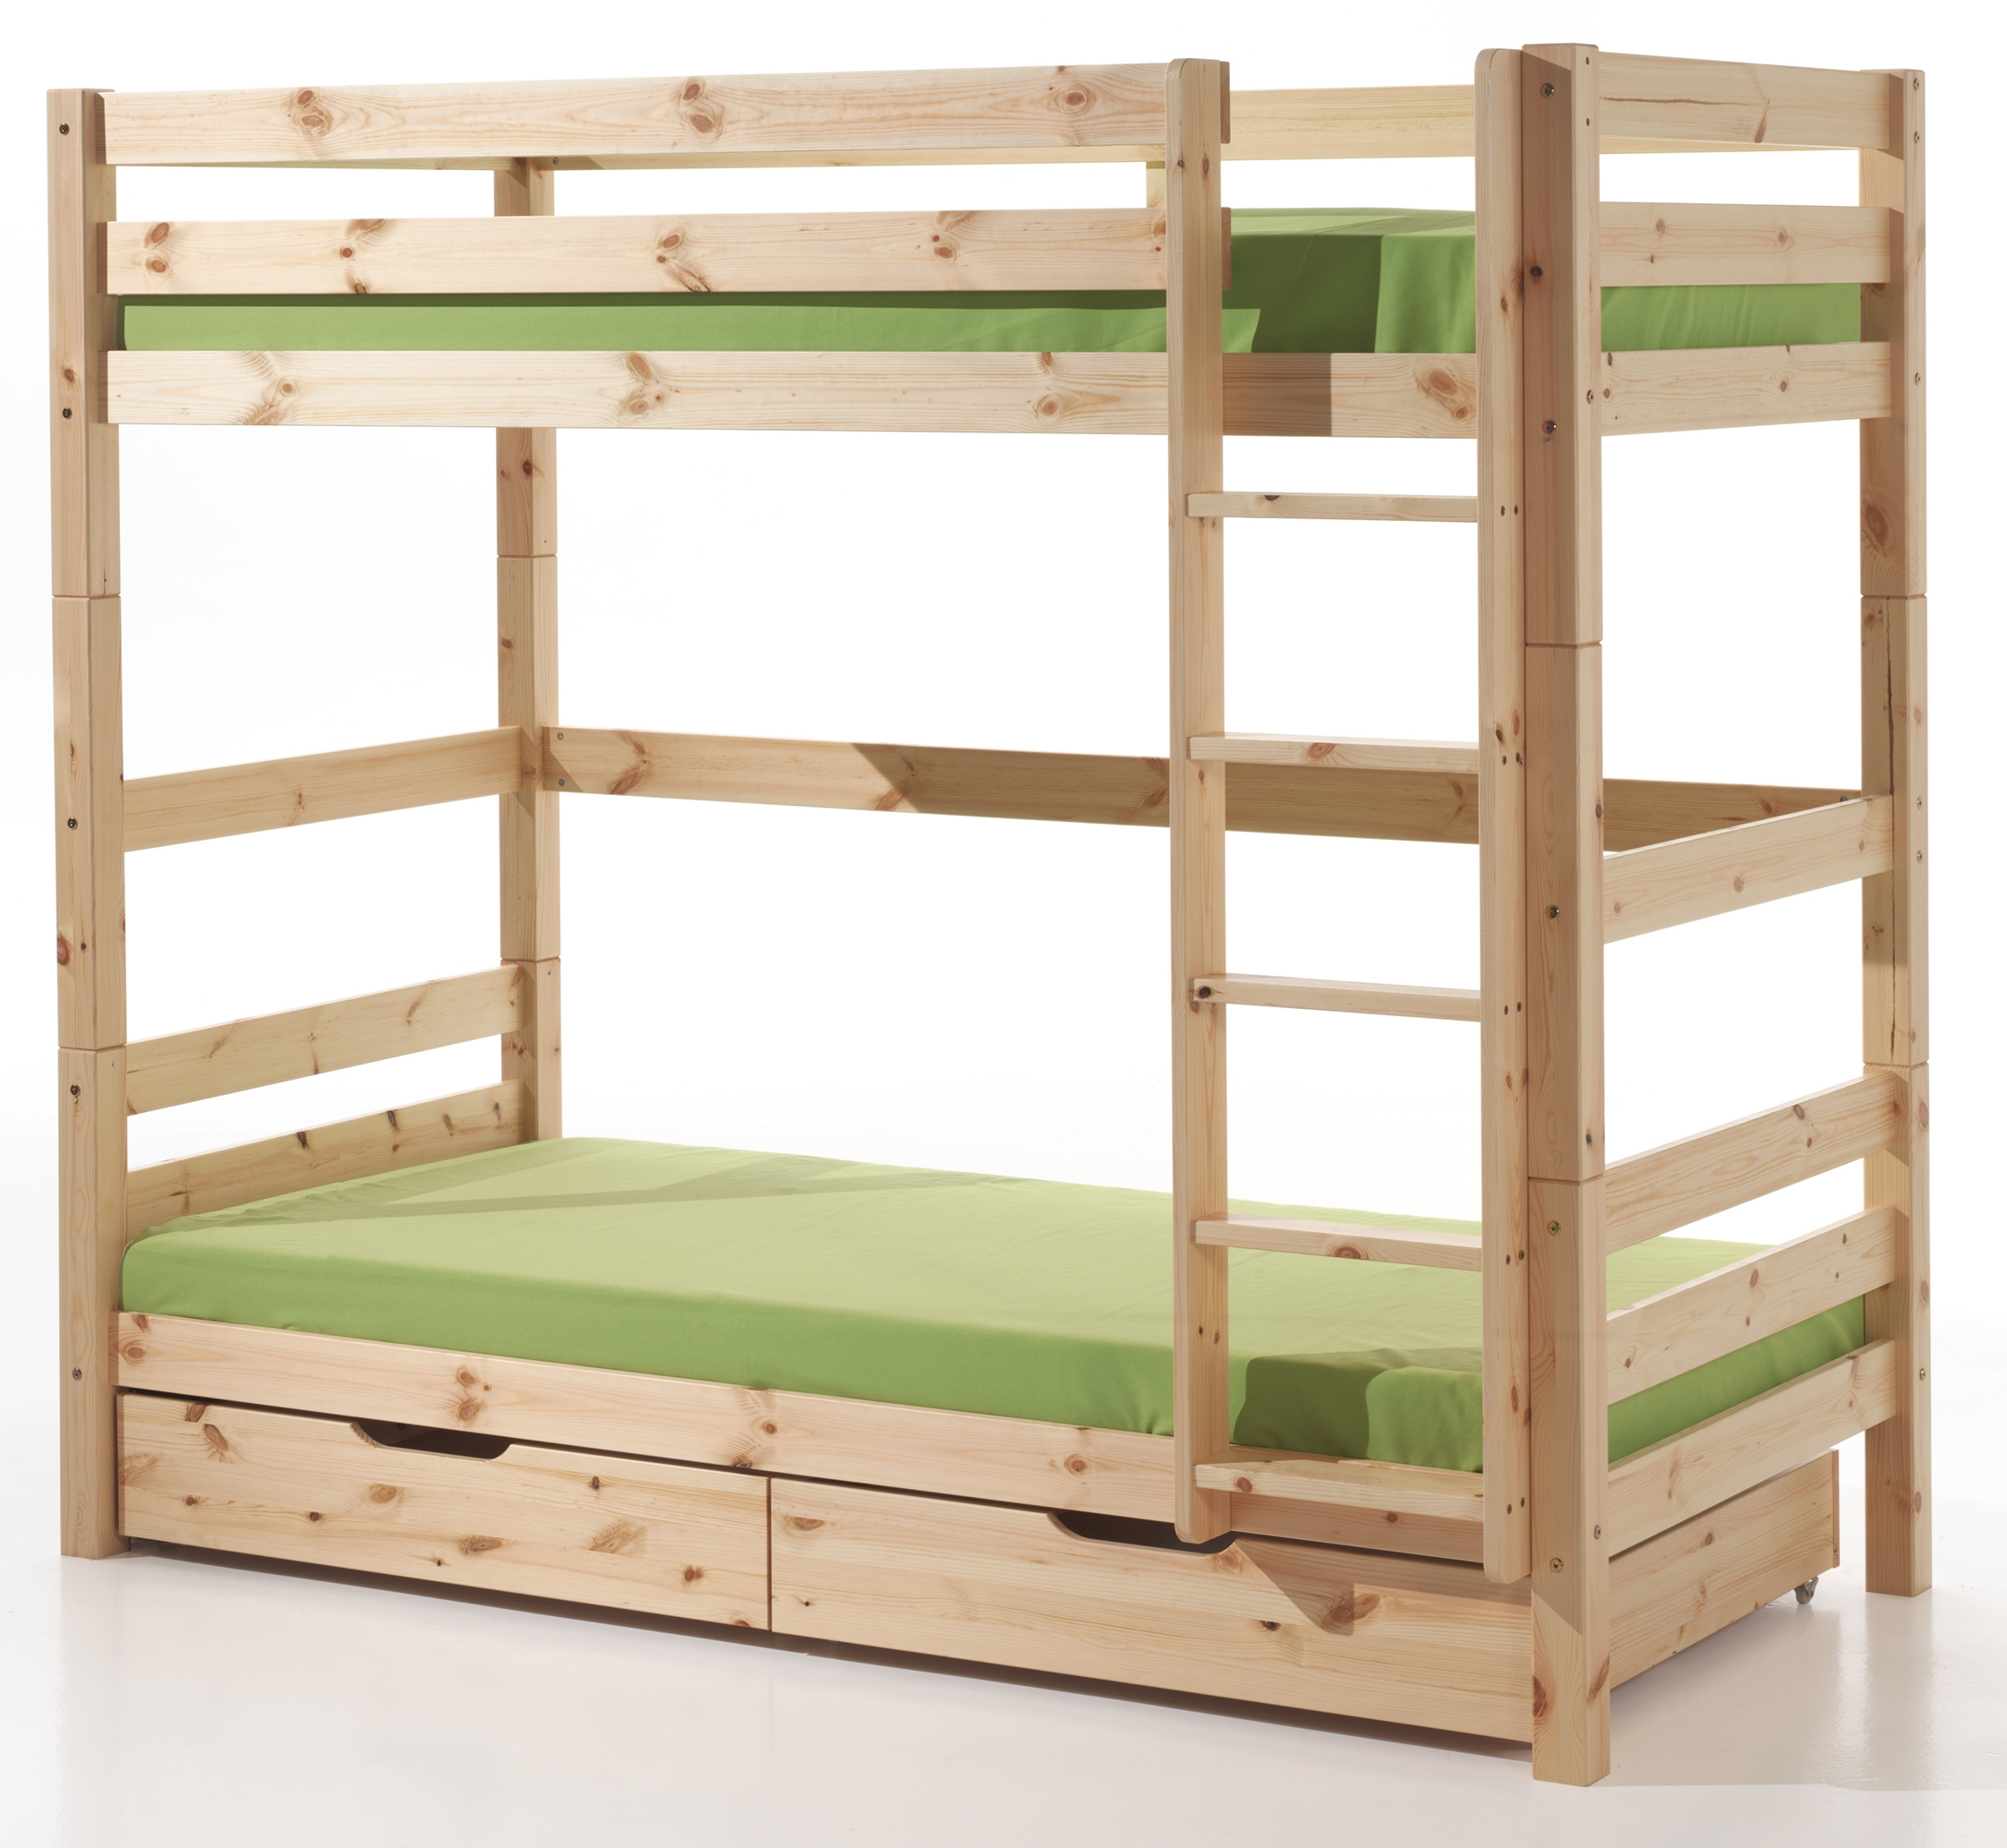 lit superpos avec tiroir pin massif naturel pinie h 180. Black Bedroom Furniture Sets. Home Design Ideas